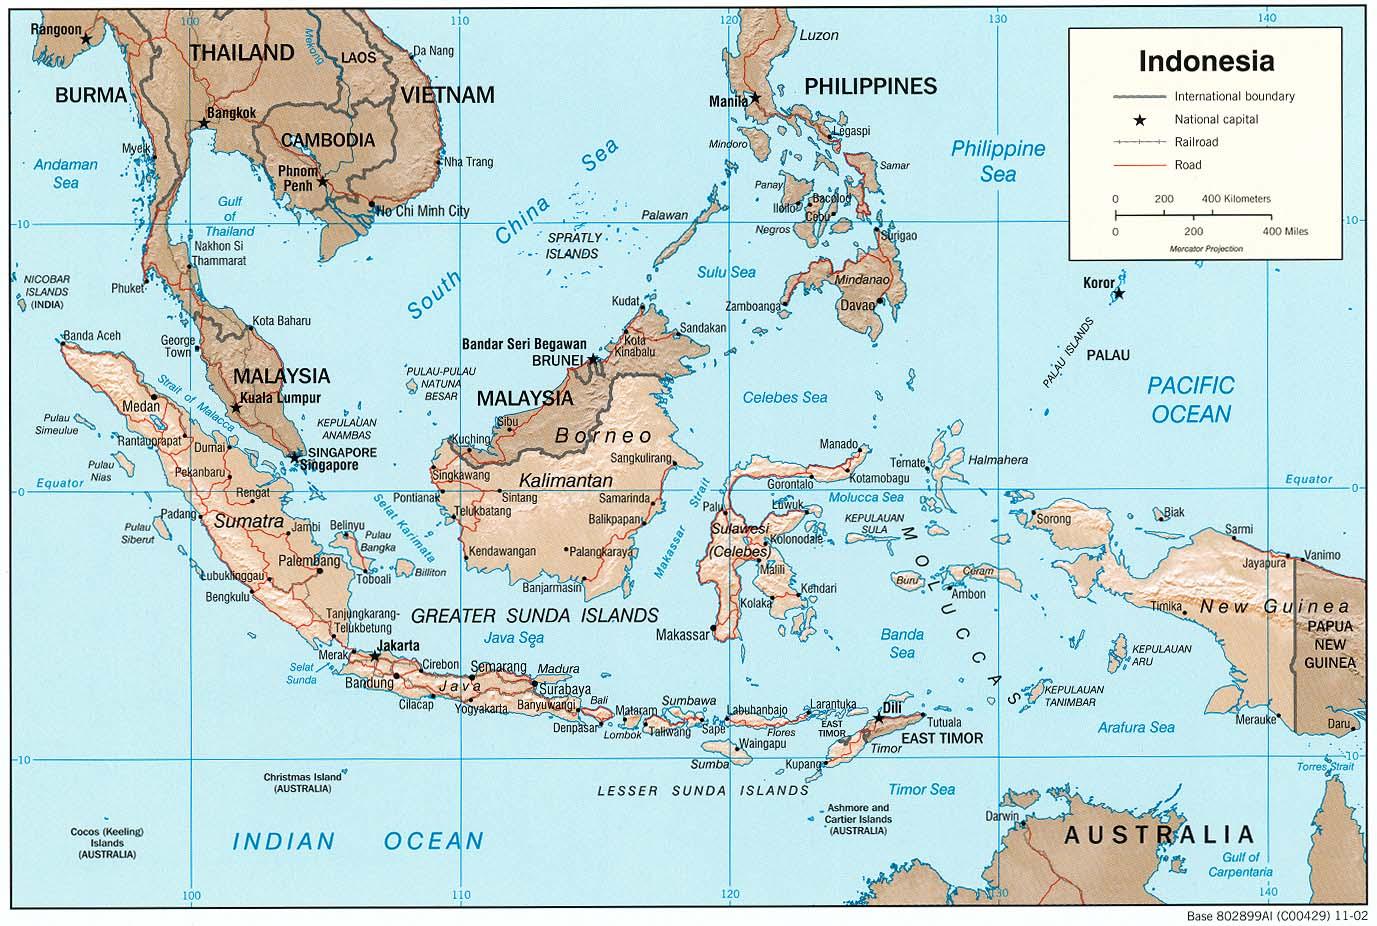 Kenali lebih dalam lagi mengenai wilayah dan provinsi yang terletak di negara sendiri dengan melihat gambar peta indonesia pada album ini. Gambar Peta Indonesia Lengkap Dengan Skala